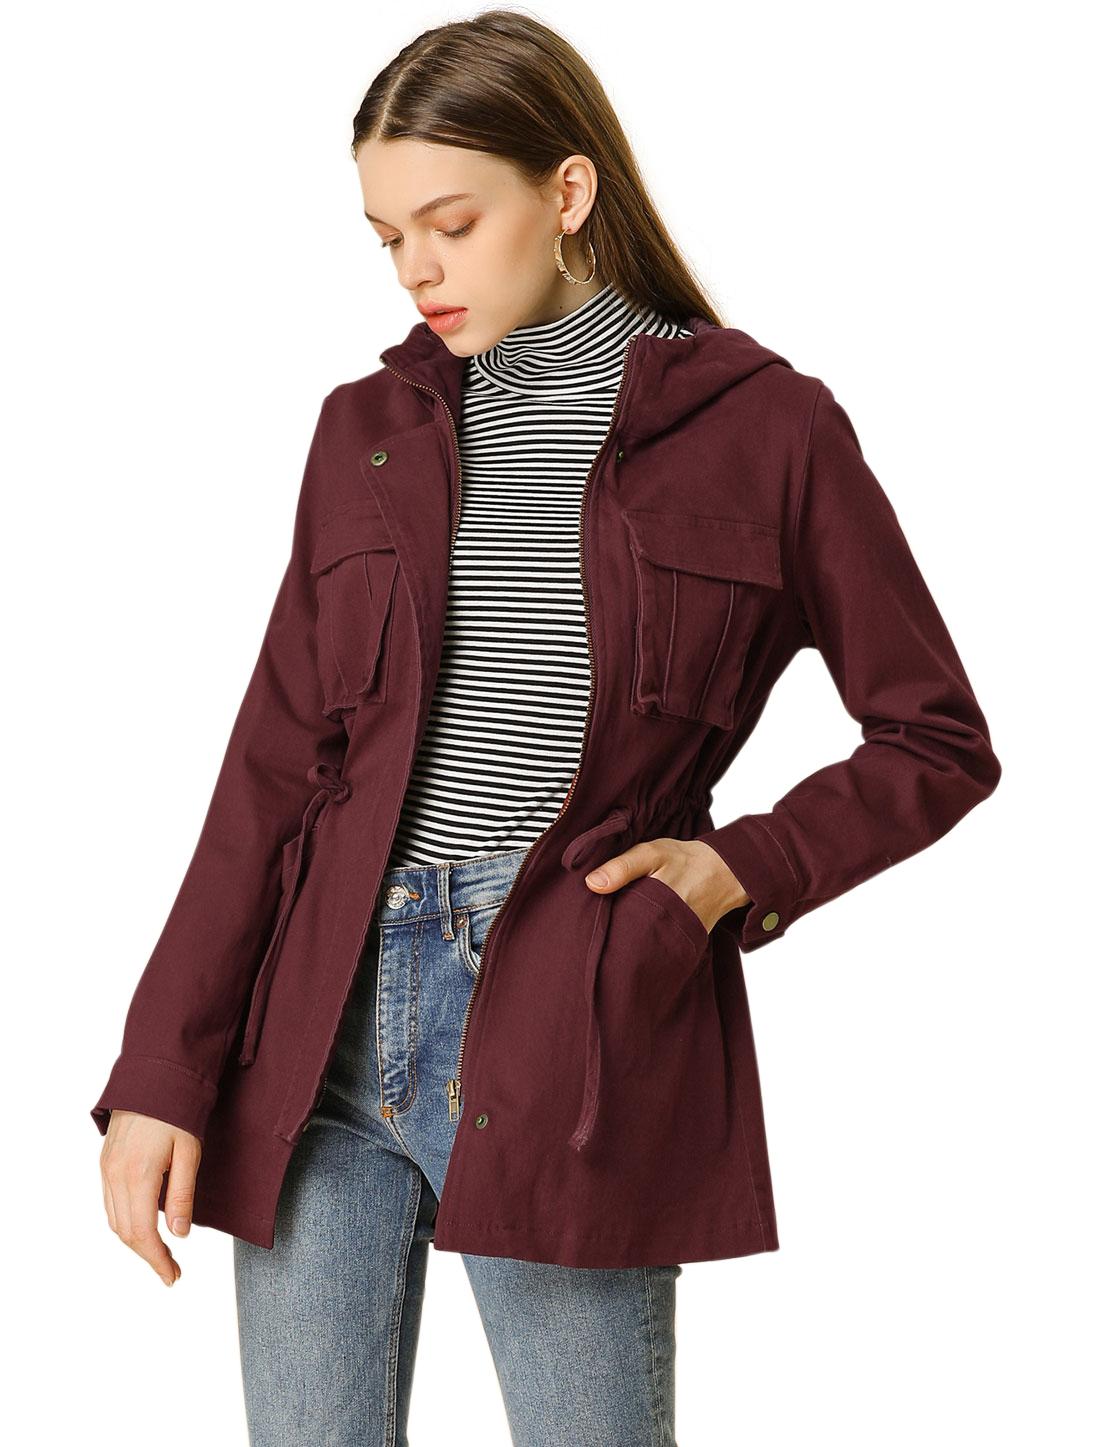 Allegra K Women's Single Breasted Zip Up Drawstring Waist Jacket Brick Red XS